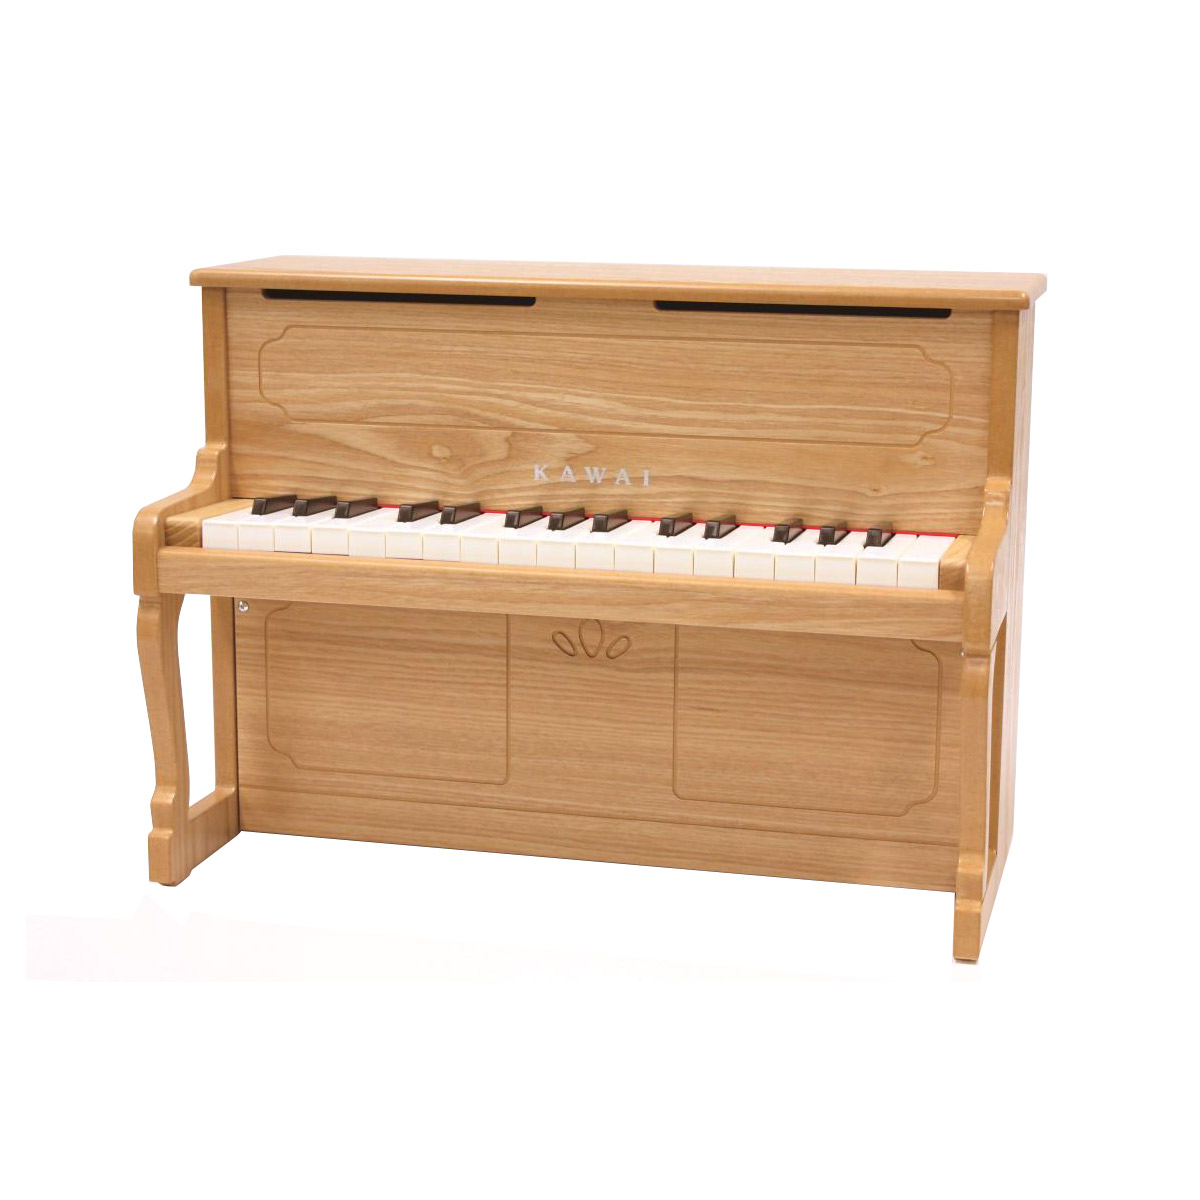 KAWAI 1154 ナチュラル ミニピアノアップライトピアノ おもちゃ 【カワイ ミニピアノ】